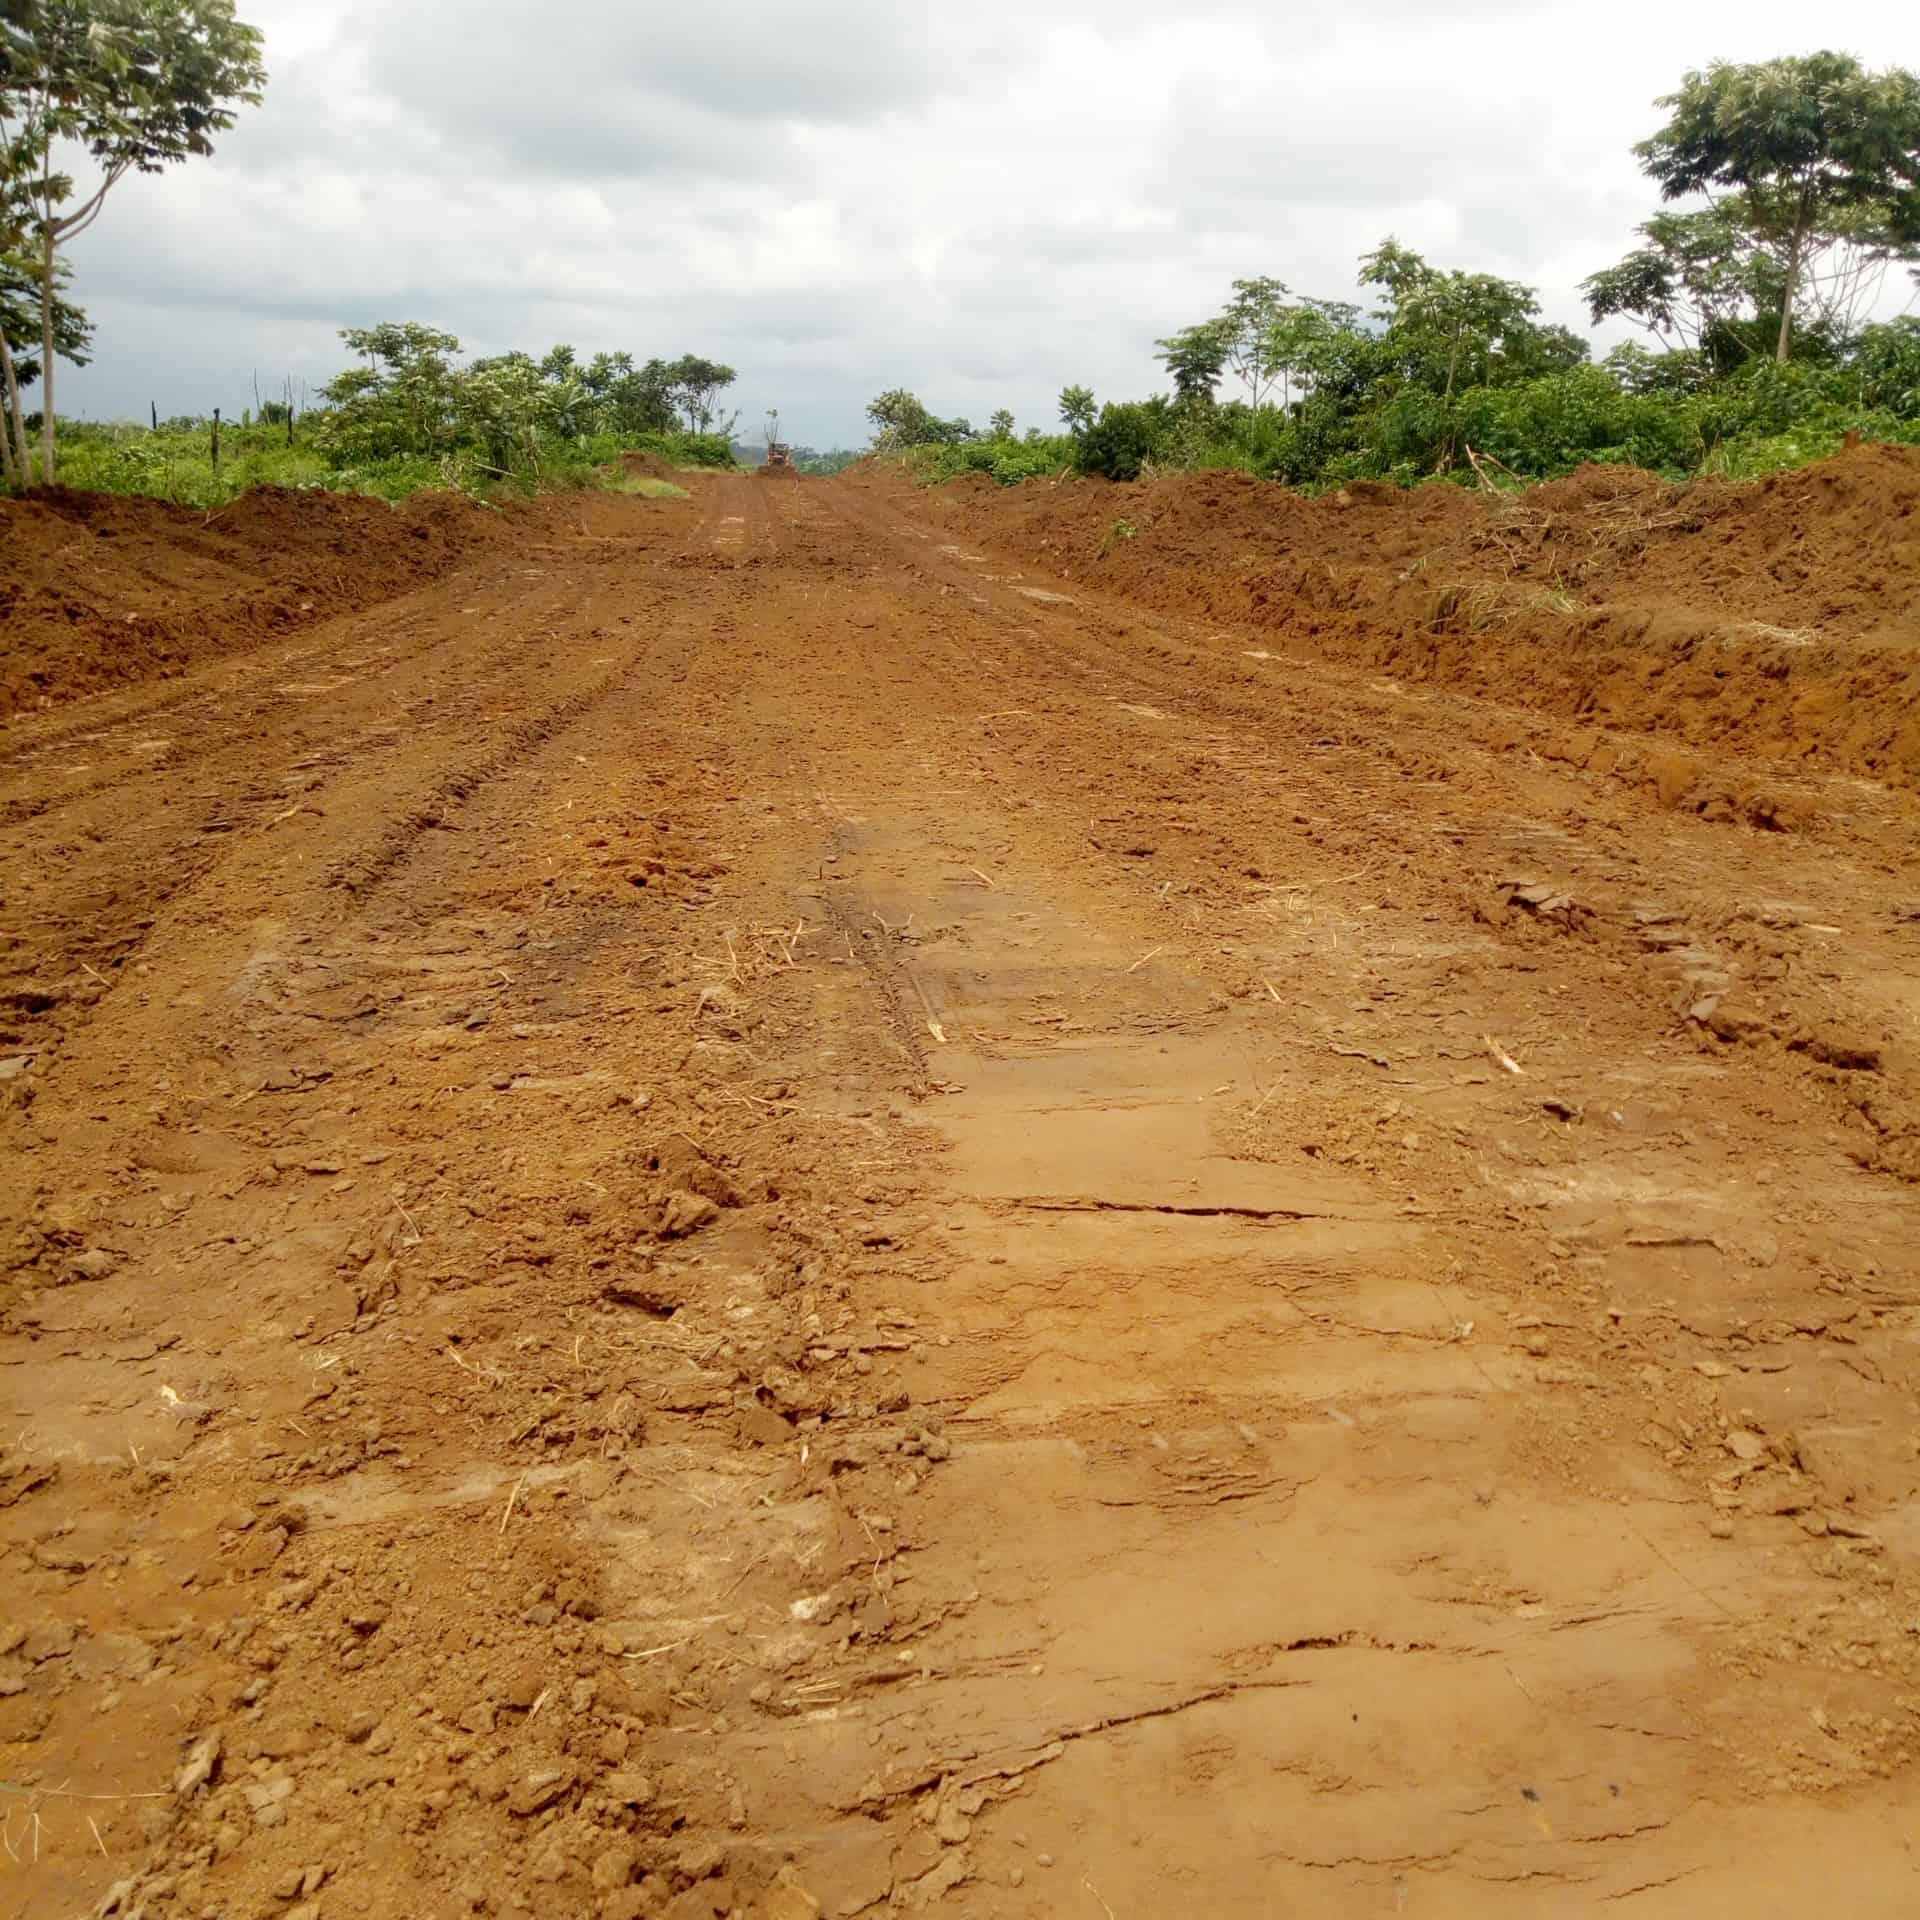 Land for sale at Douala, Bangue, Baobab bangue - 150 m2 - 4 000 000 FCFA